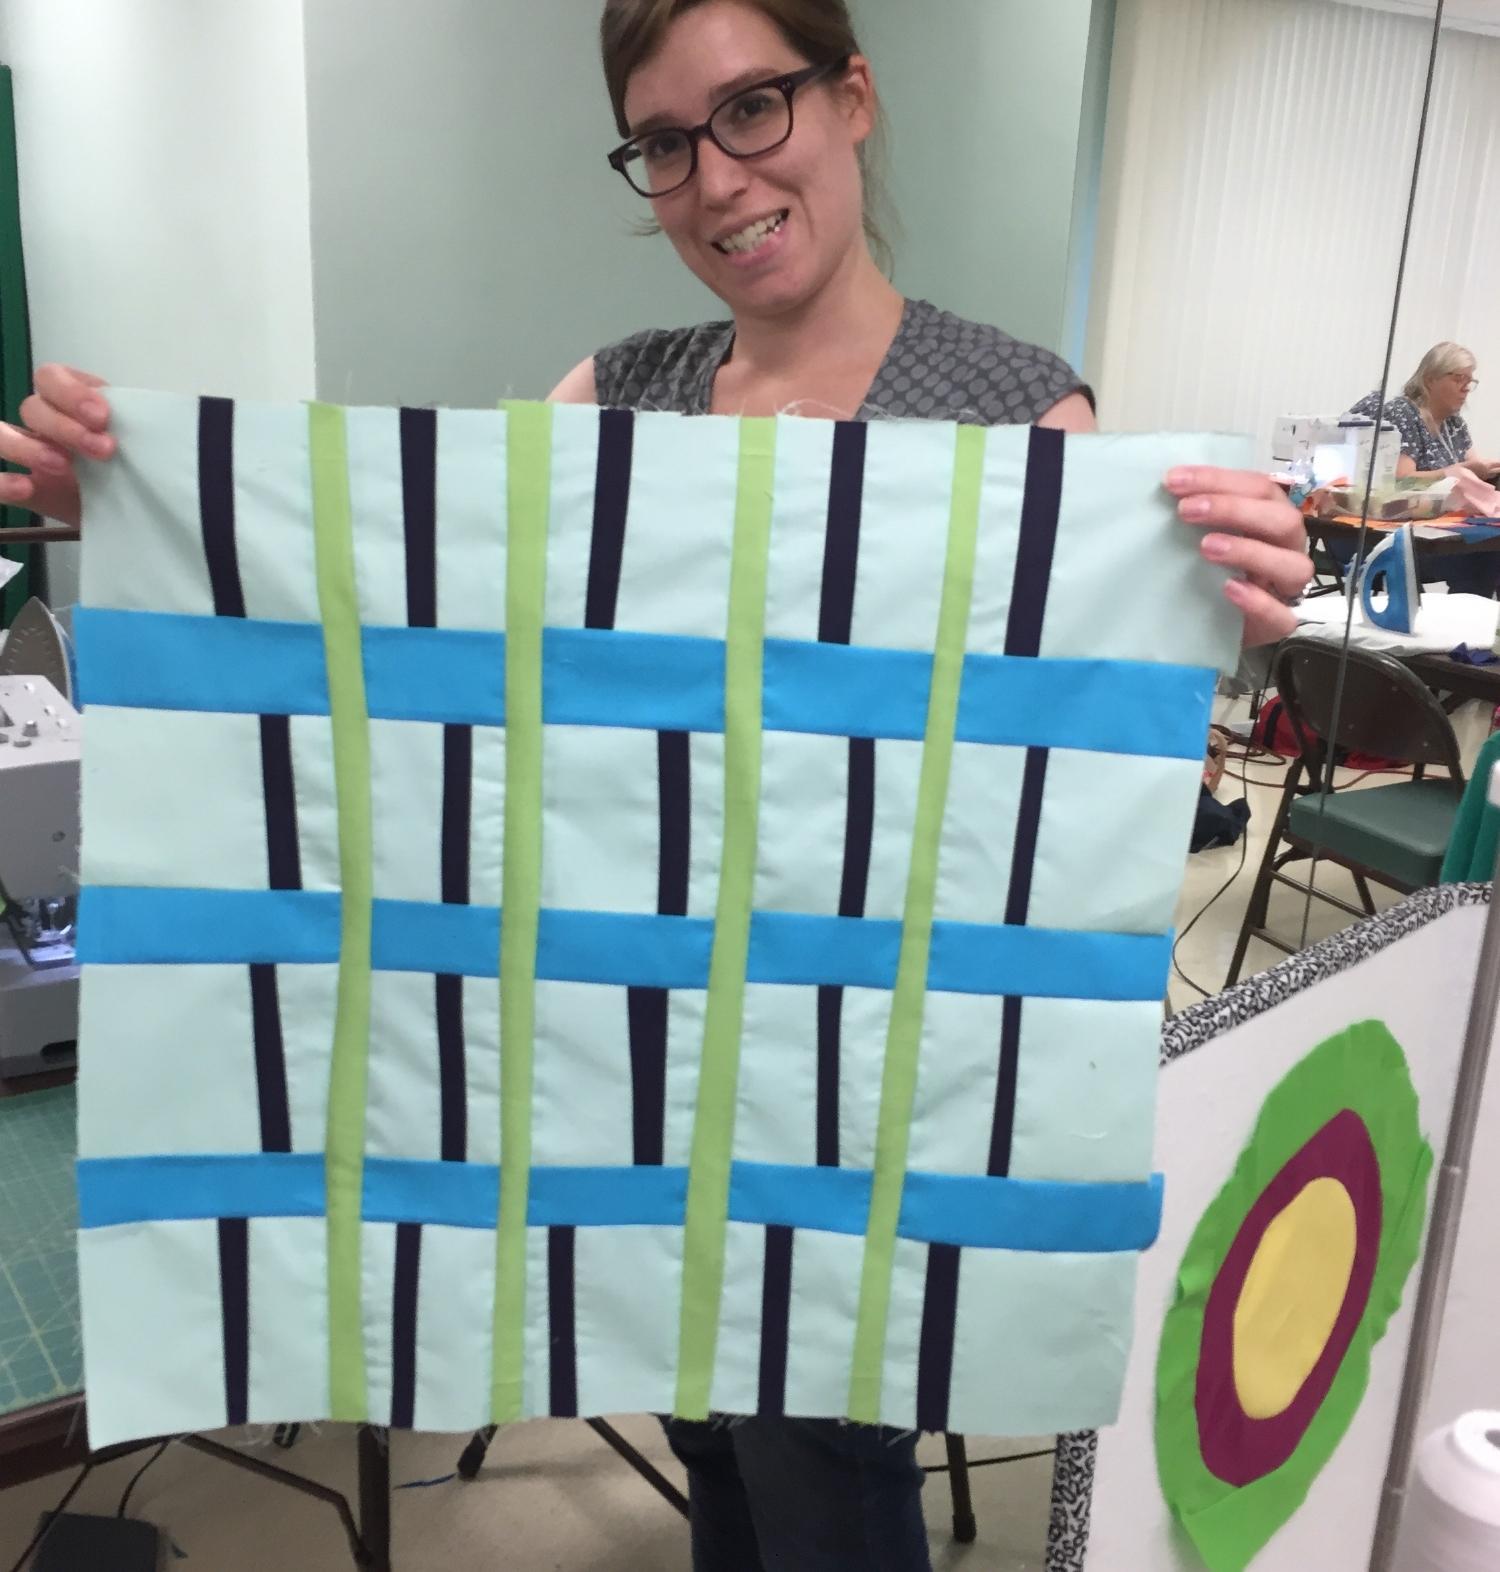 Kate Yates with plaid tartan